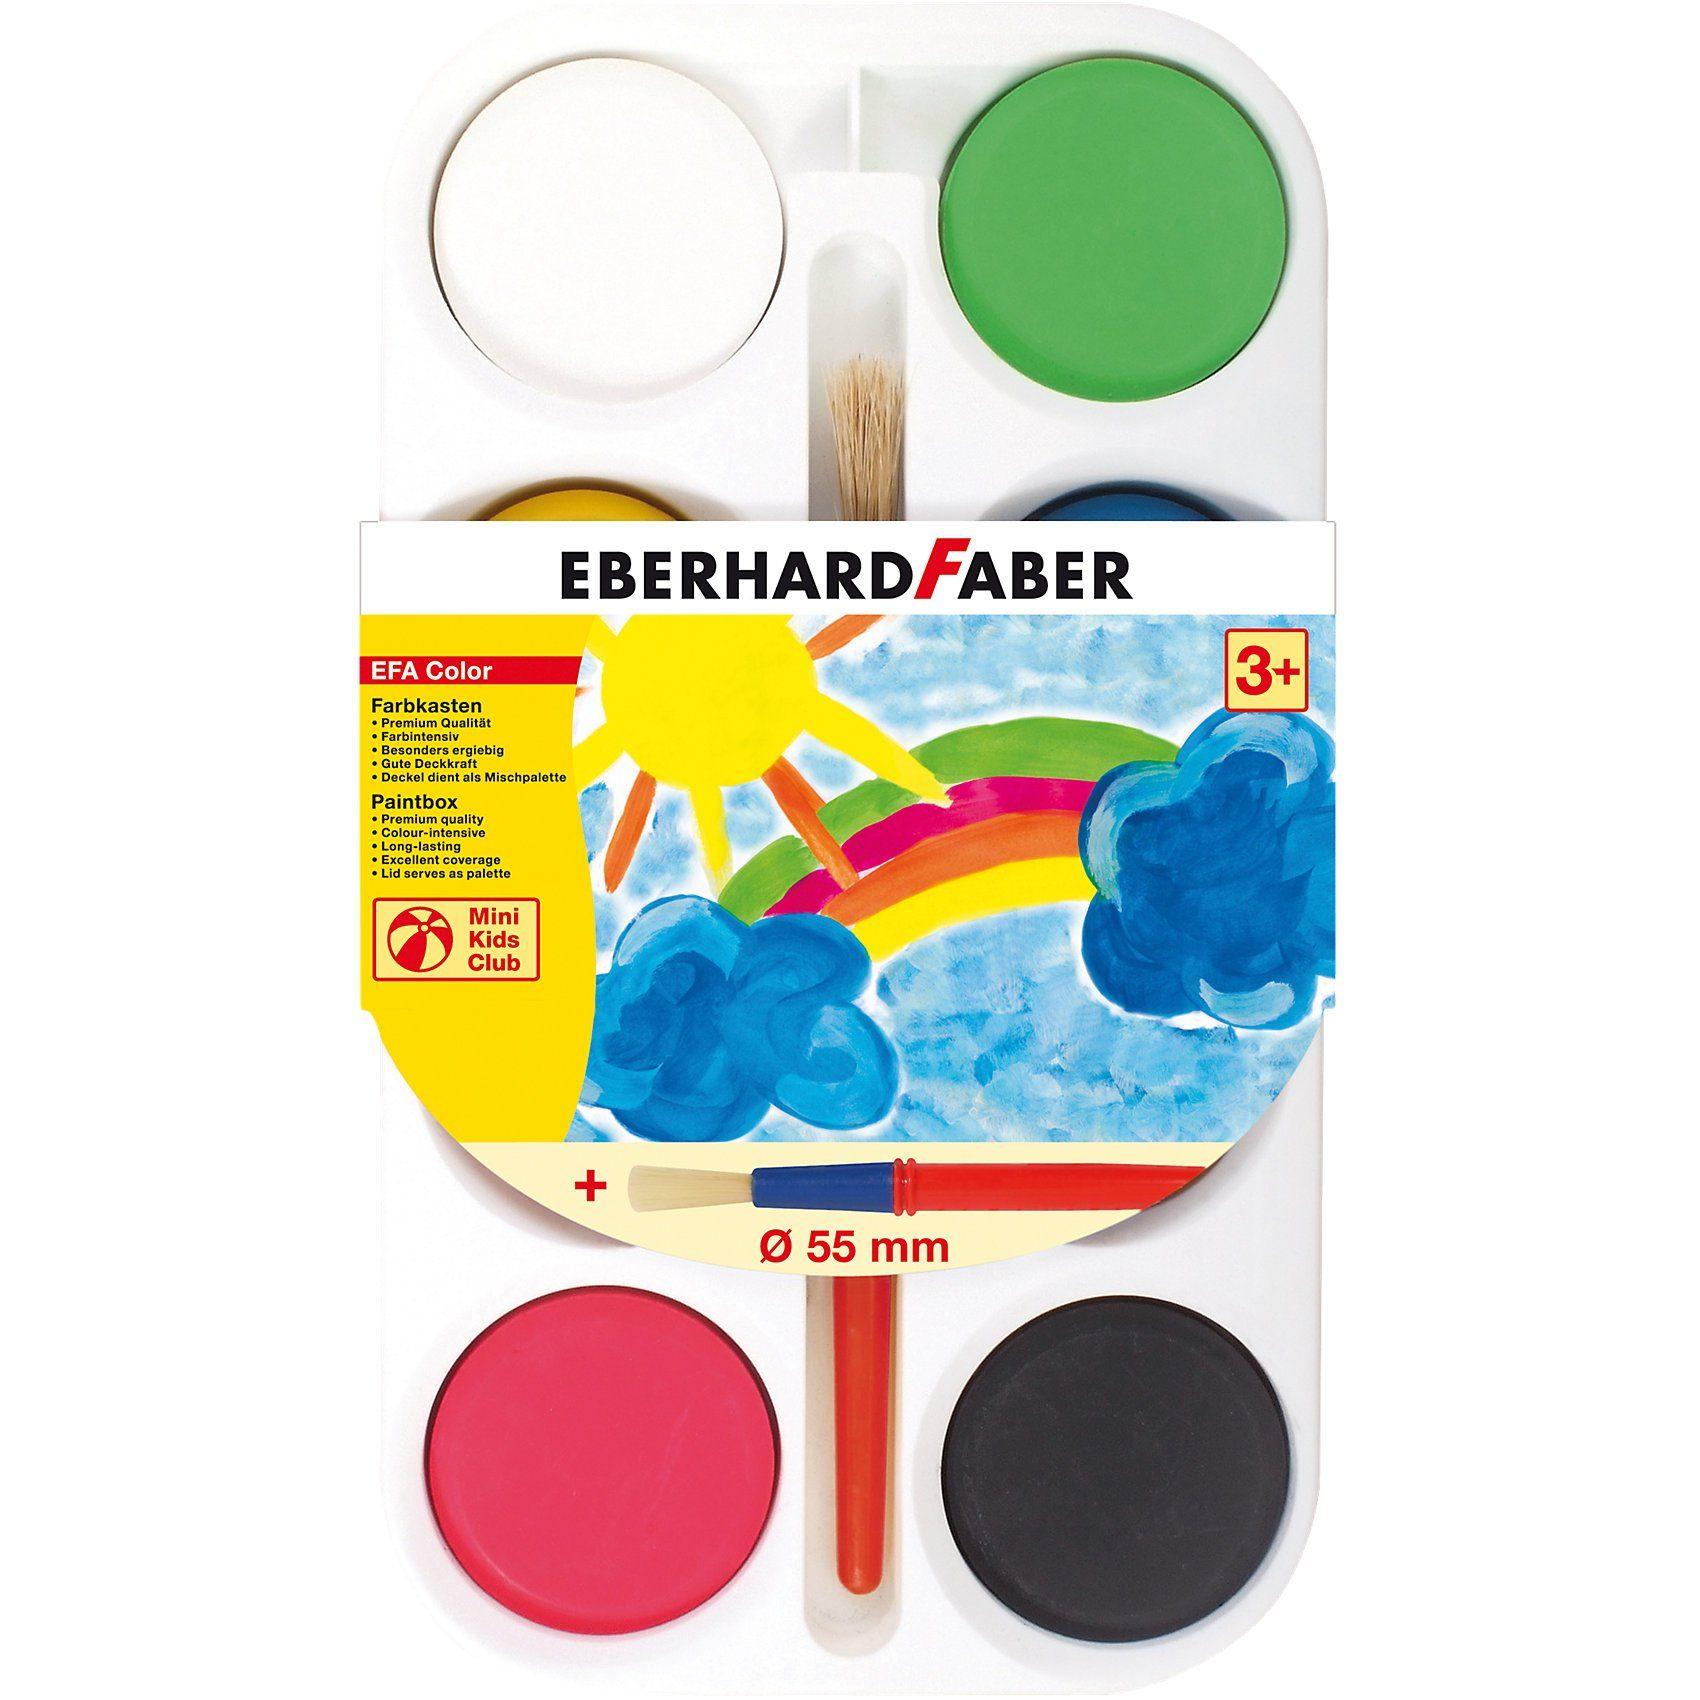 Eberhard Faber Mini Kids Farbkasten, 8 Farben & Pinsel